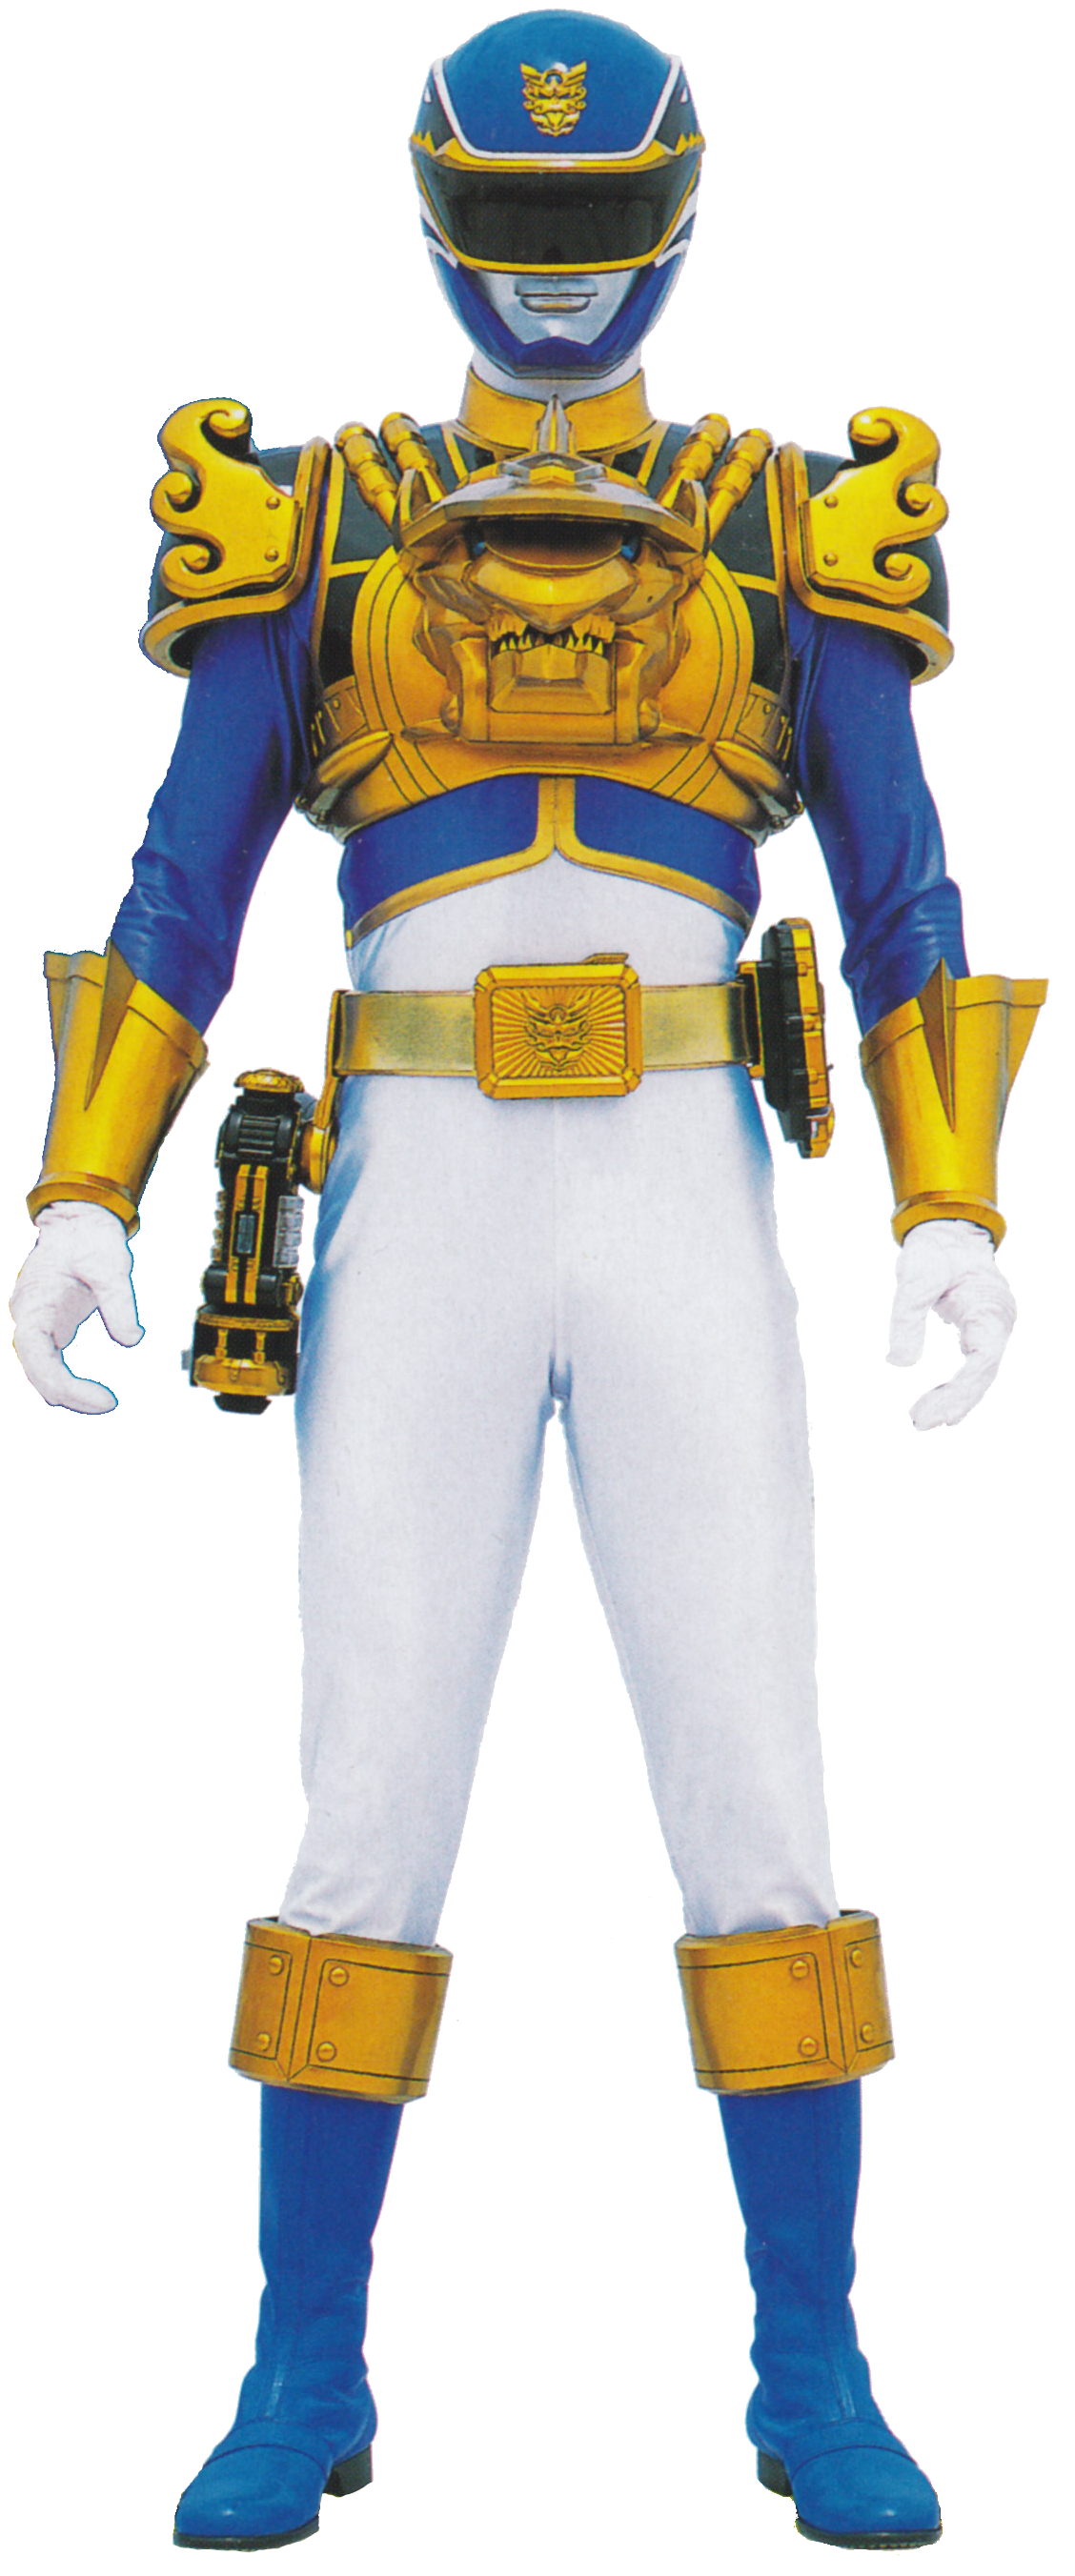 Image - Ultra Blue Ranger (Power Rangers Megaforce).png   Power ...